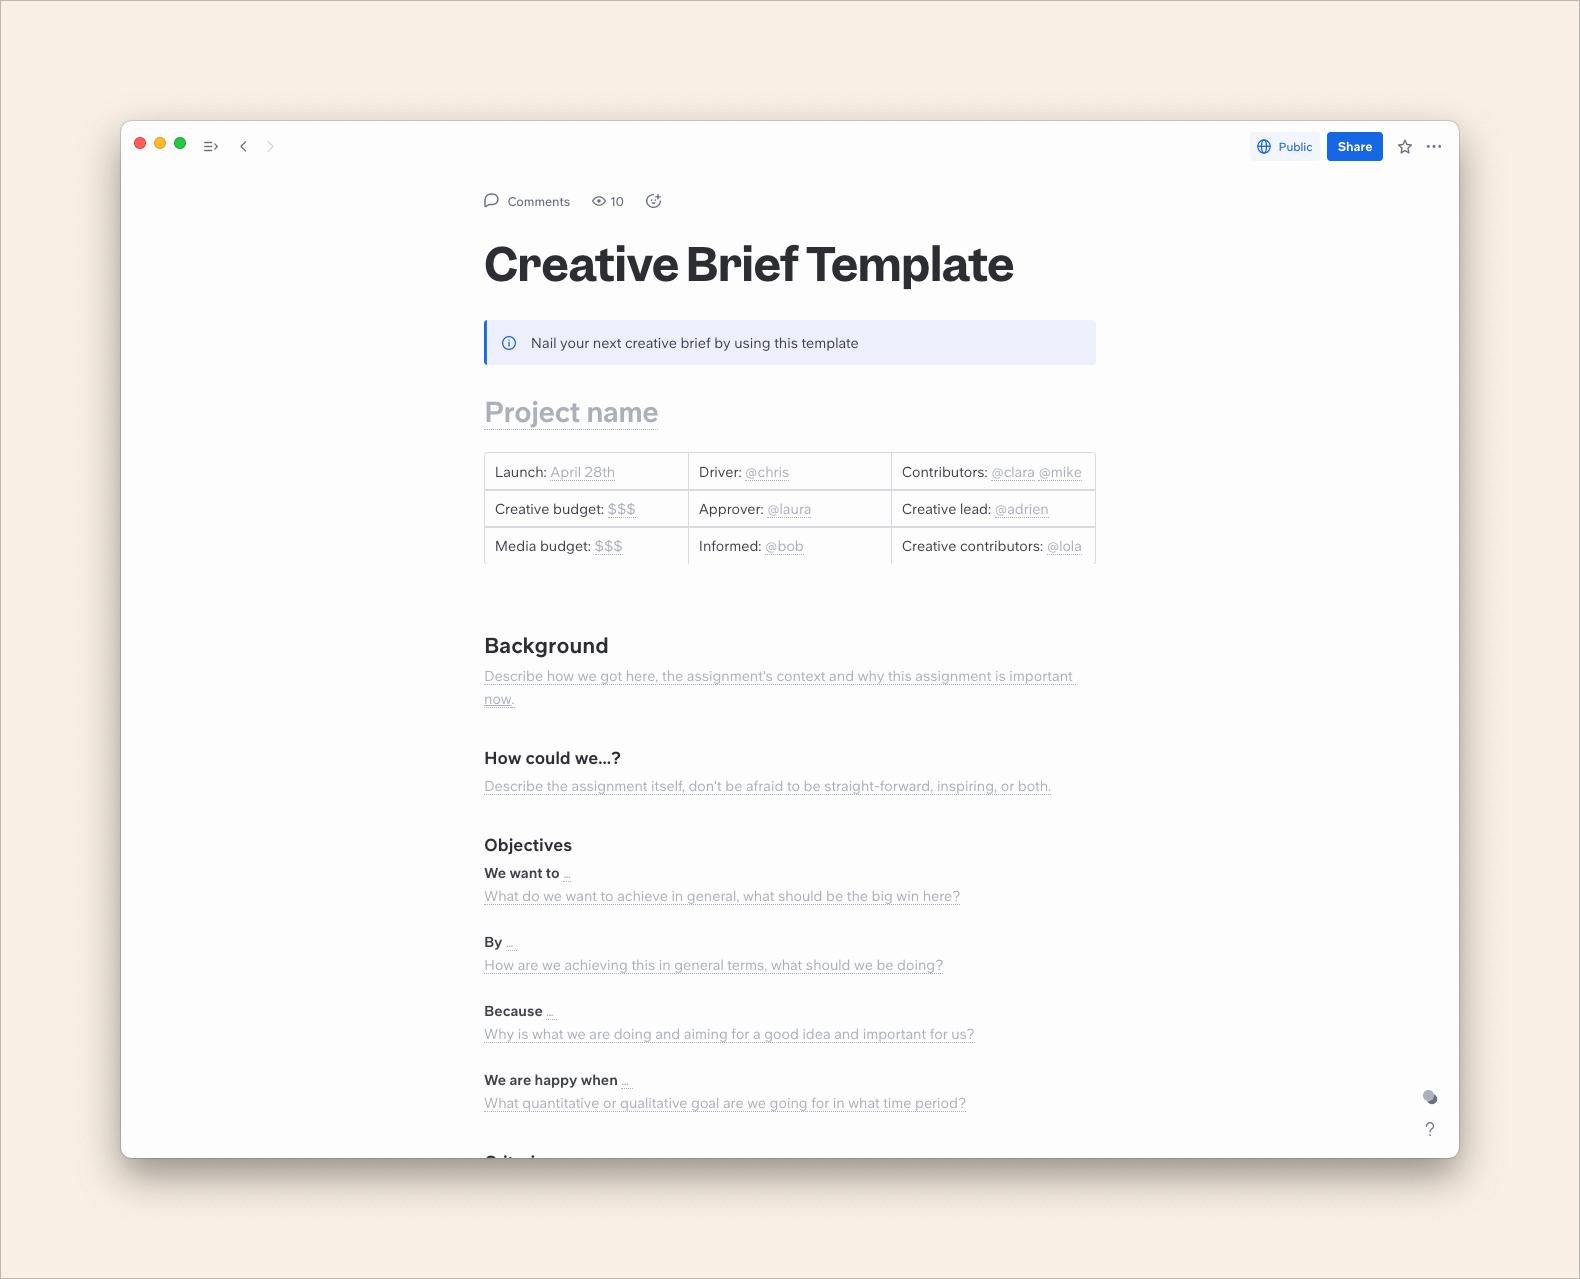 Creative Brief Template